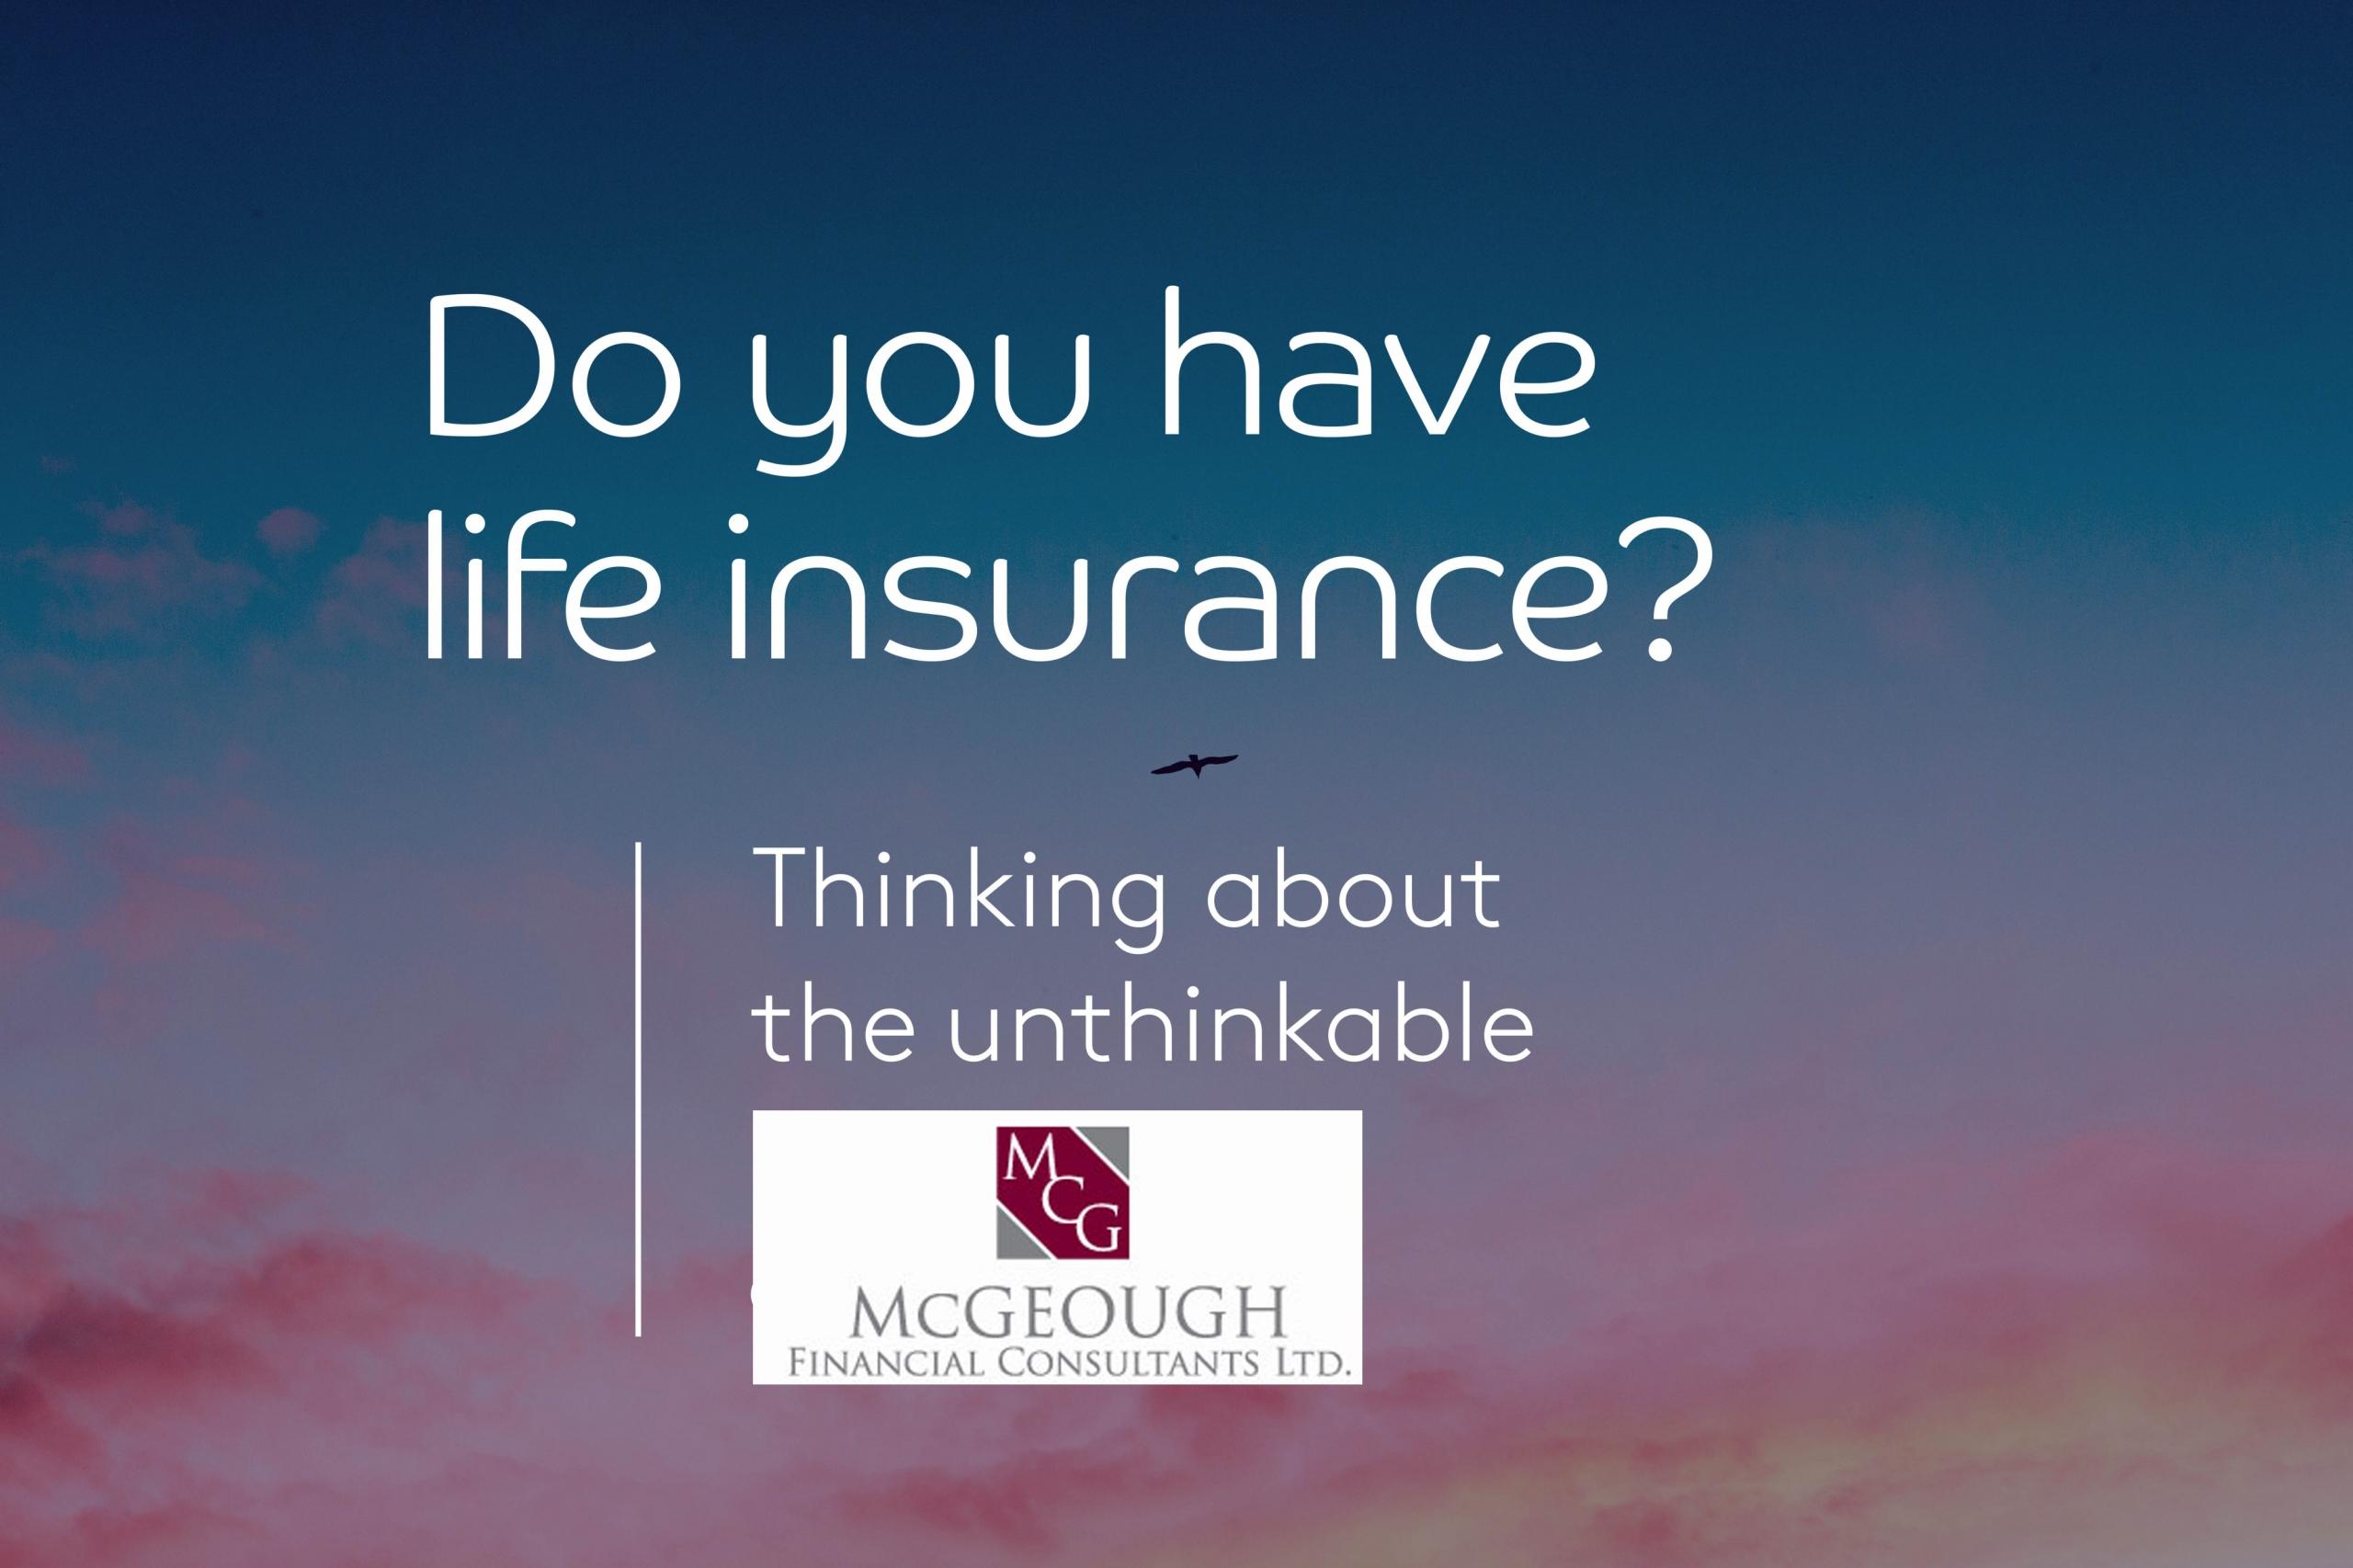 McGeough Financial Life Insurance